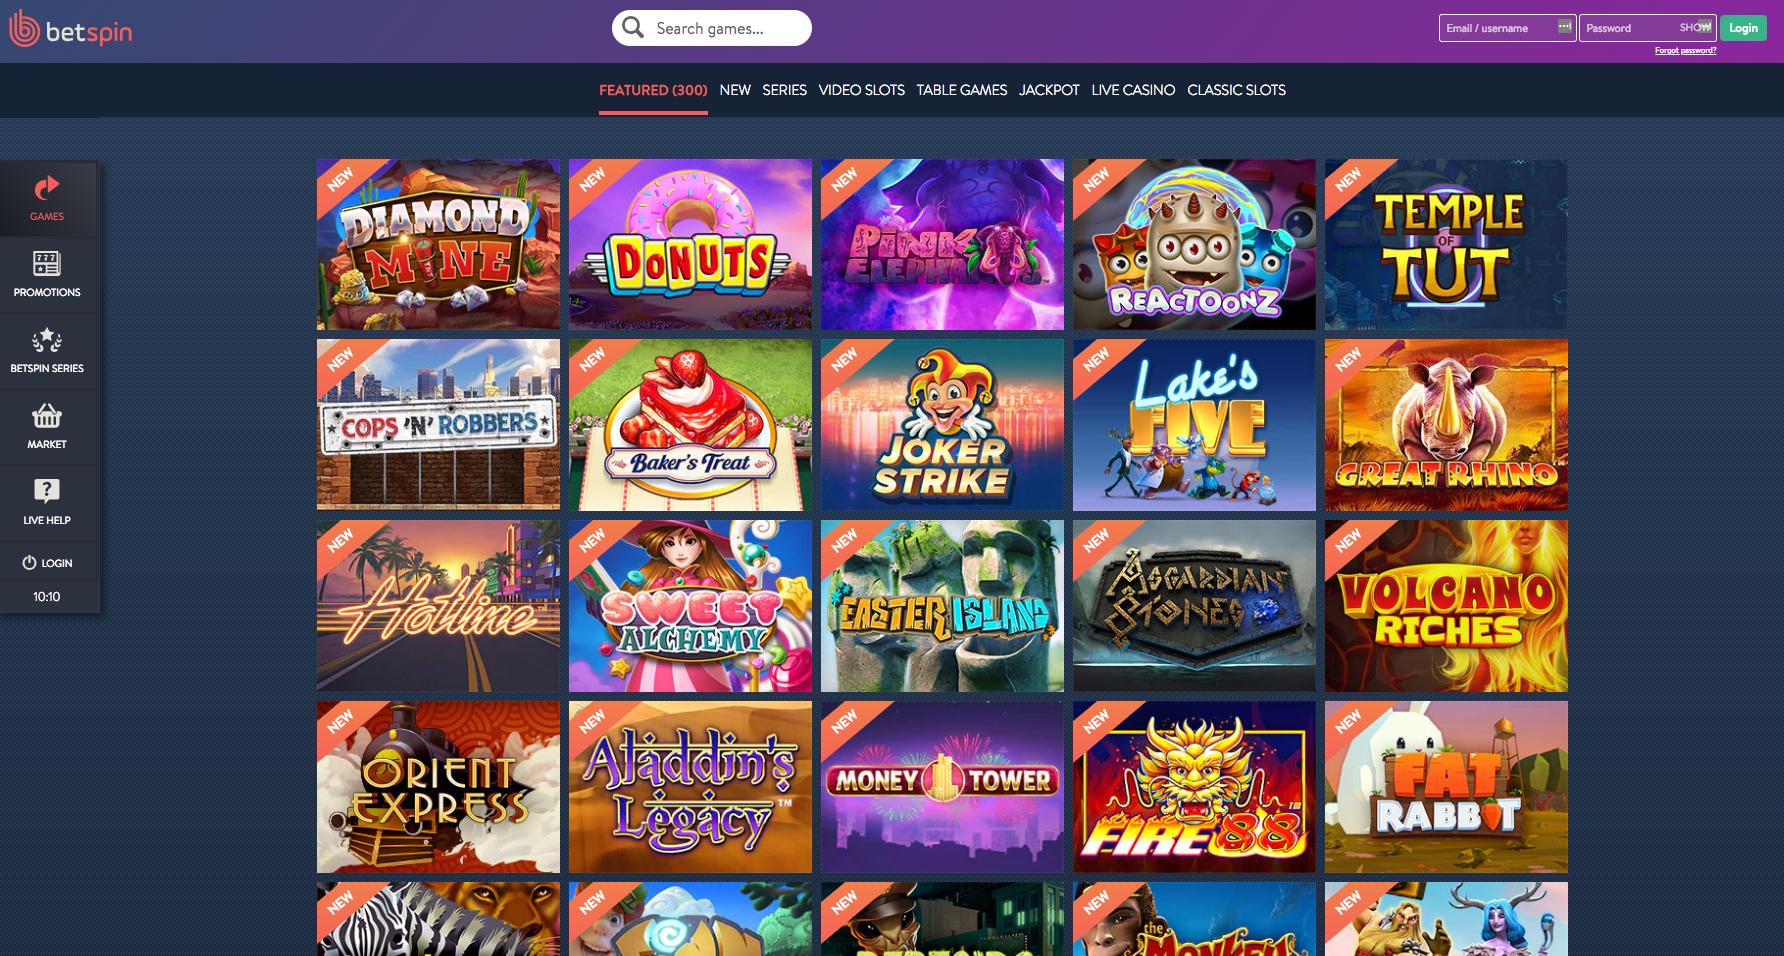 Betspin Casino upea pelivalikoima